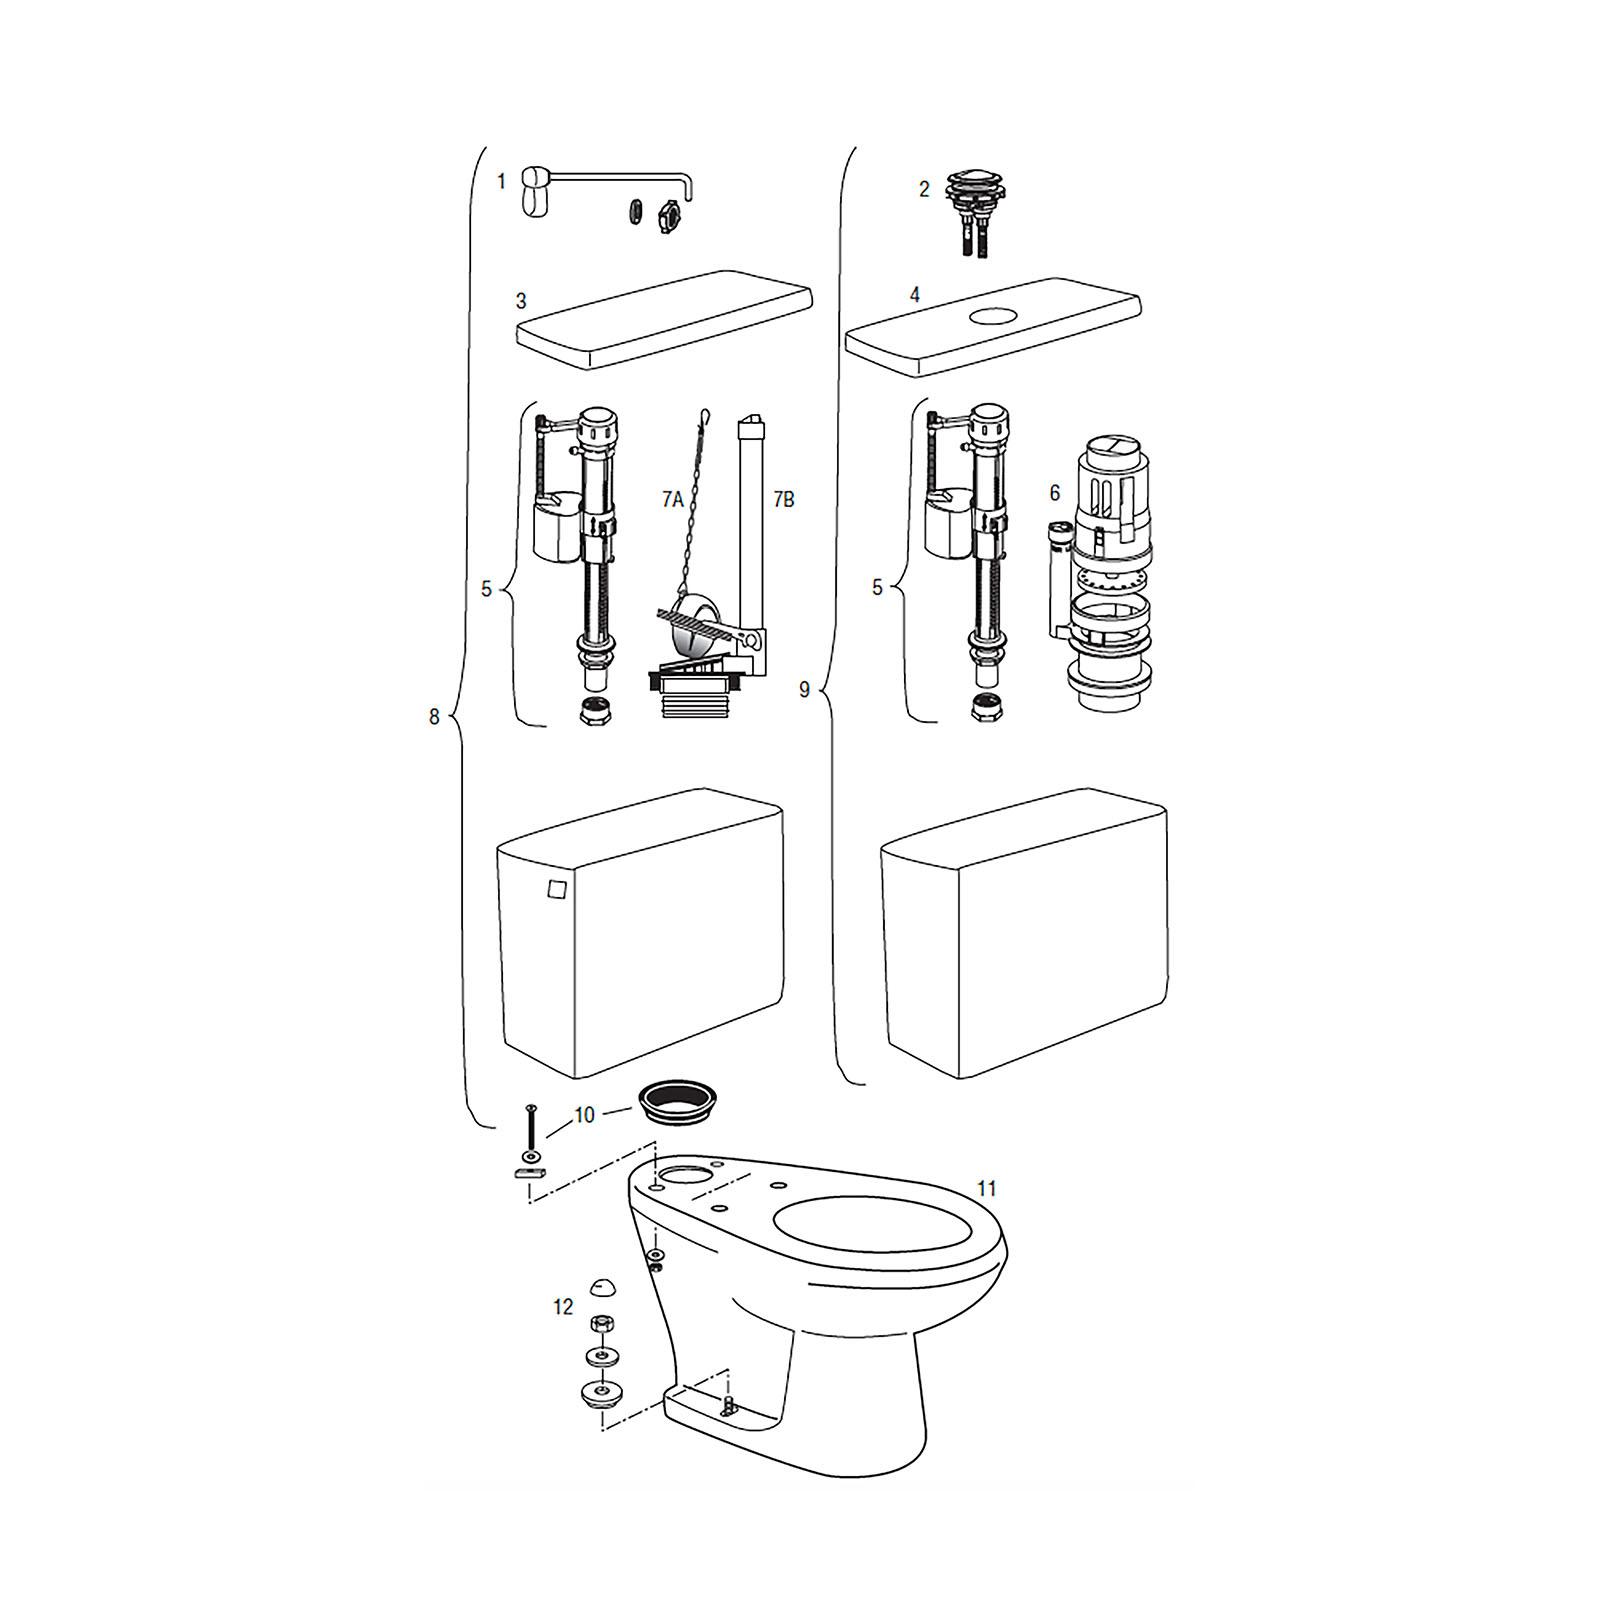 Xlerator Hand Dryer Wiring Diagram Dayton Wiring Diagram